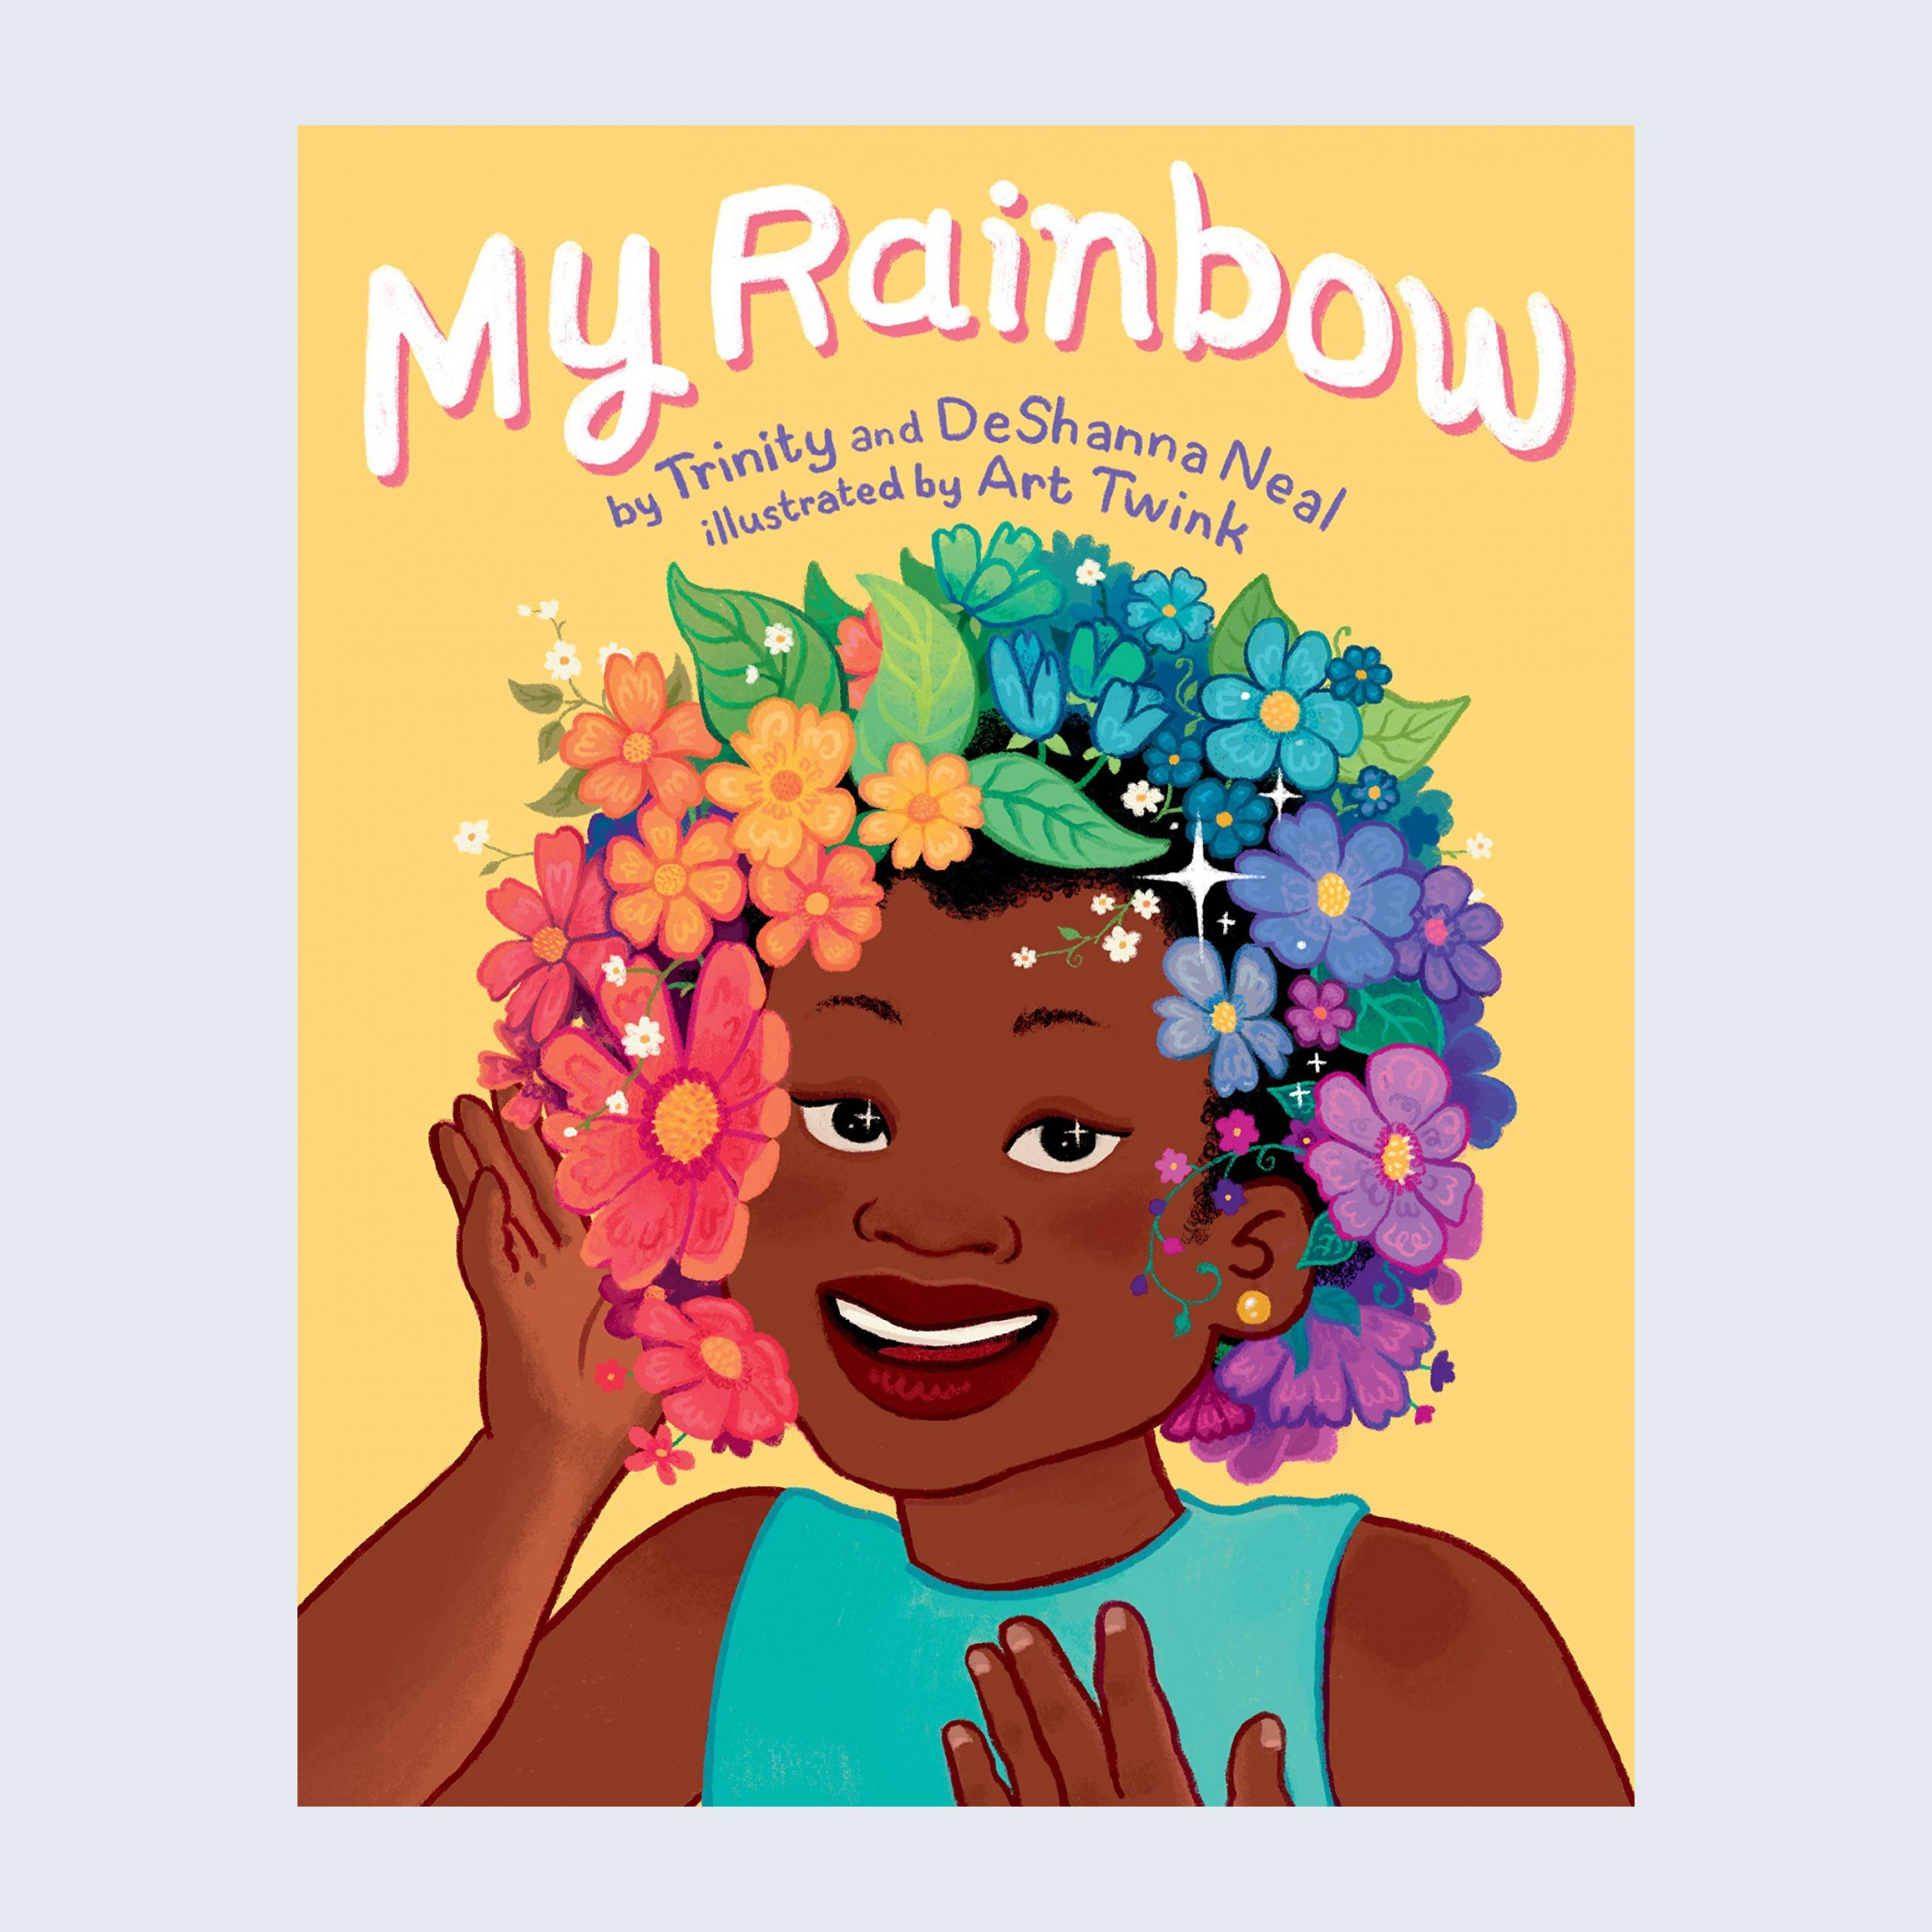 My Rainbow by DeShanna and Trinity Neal